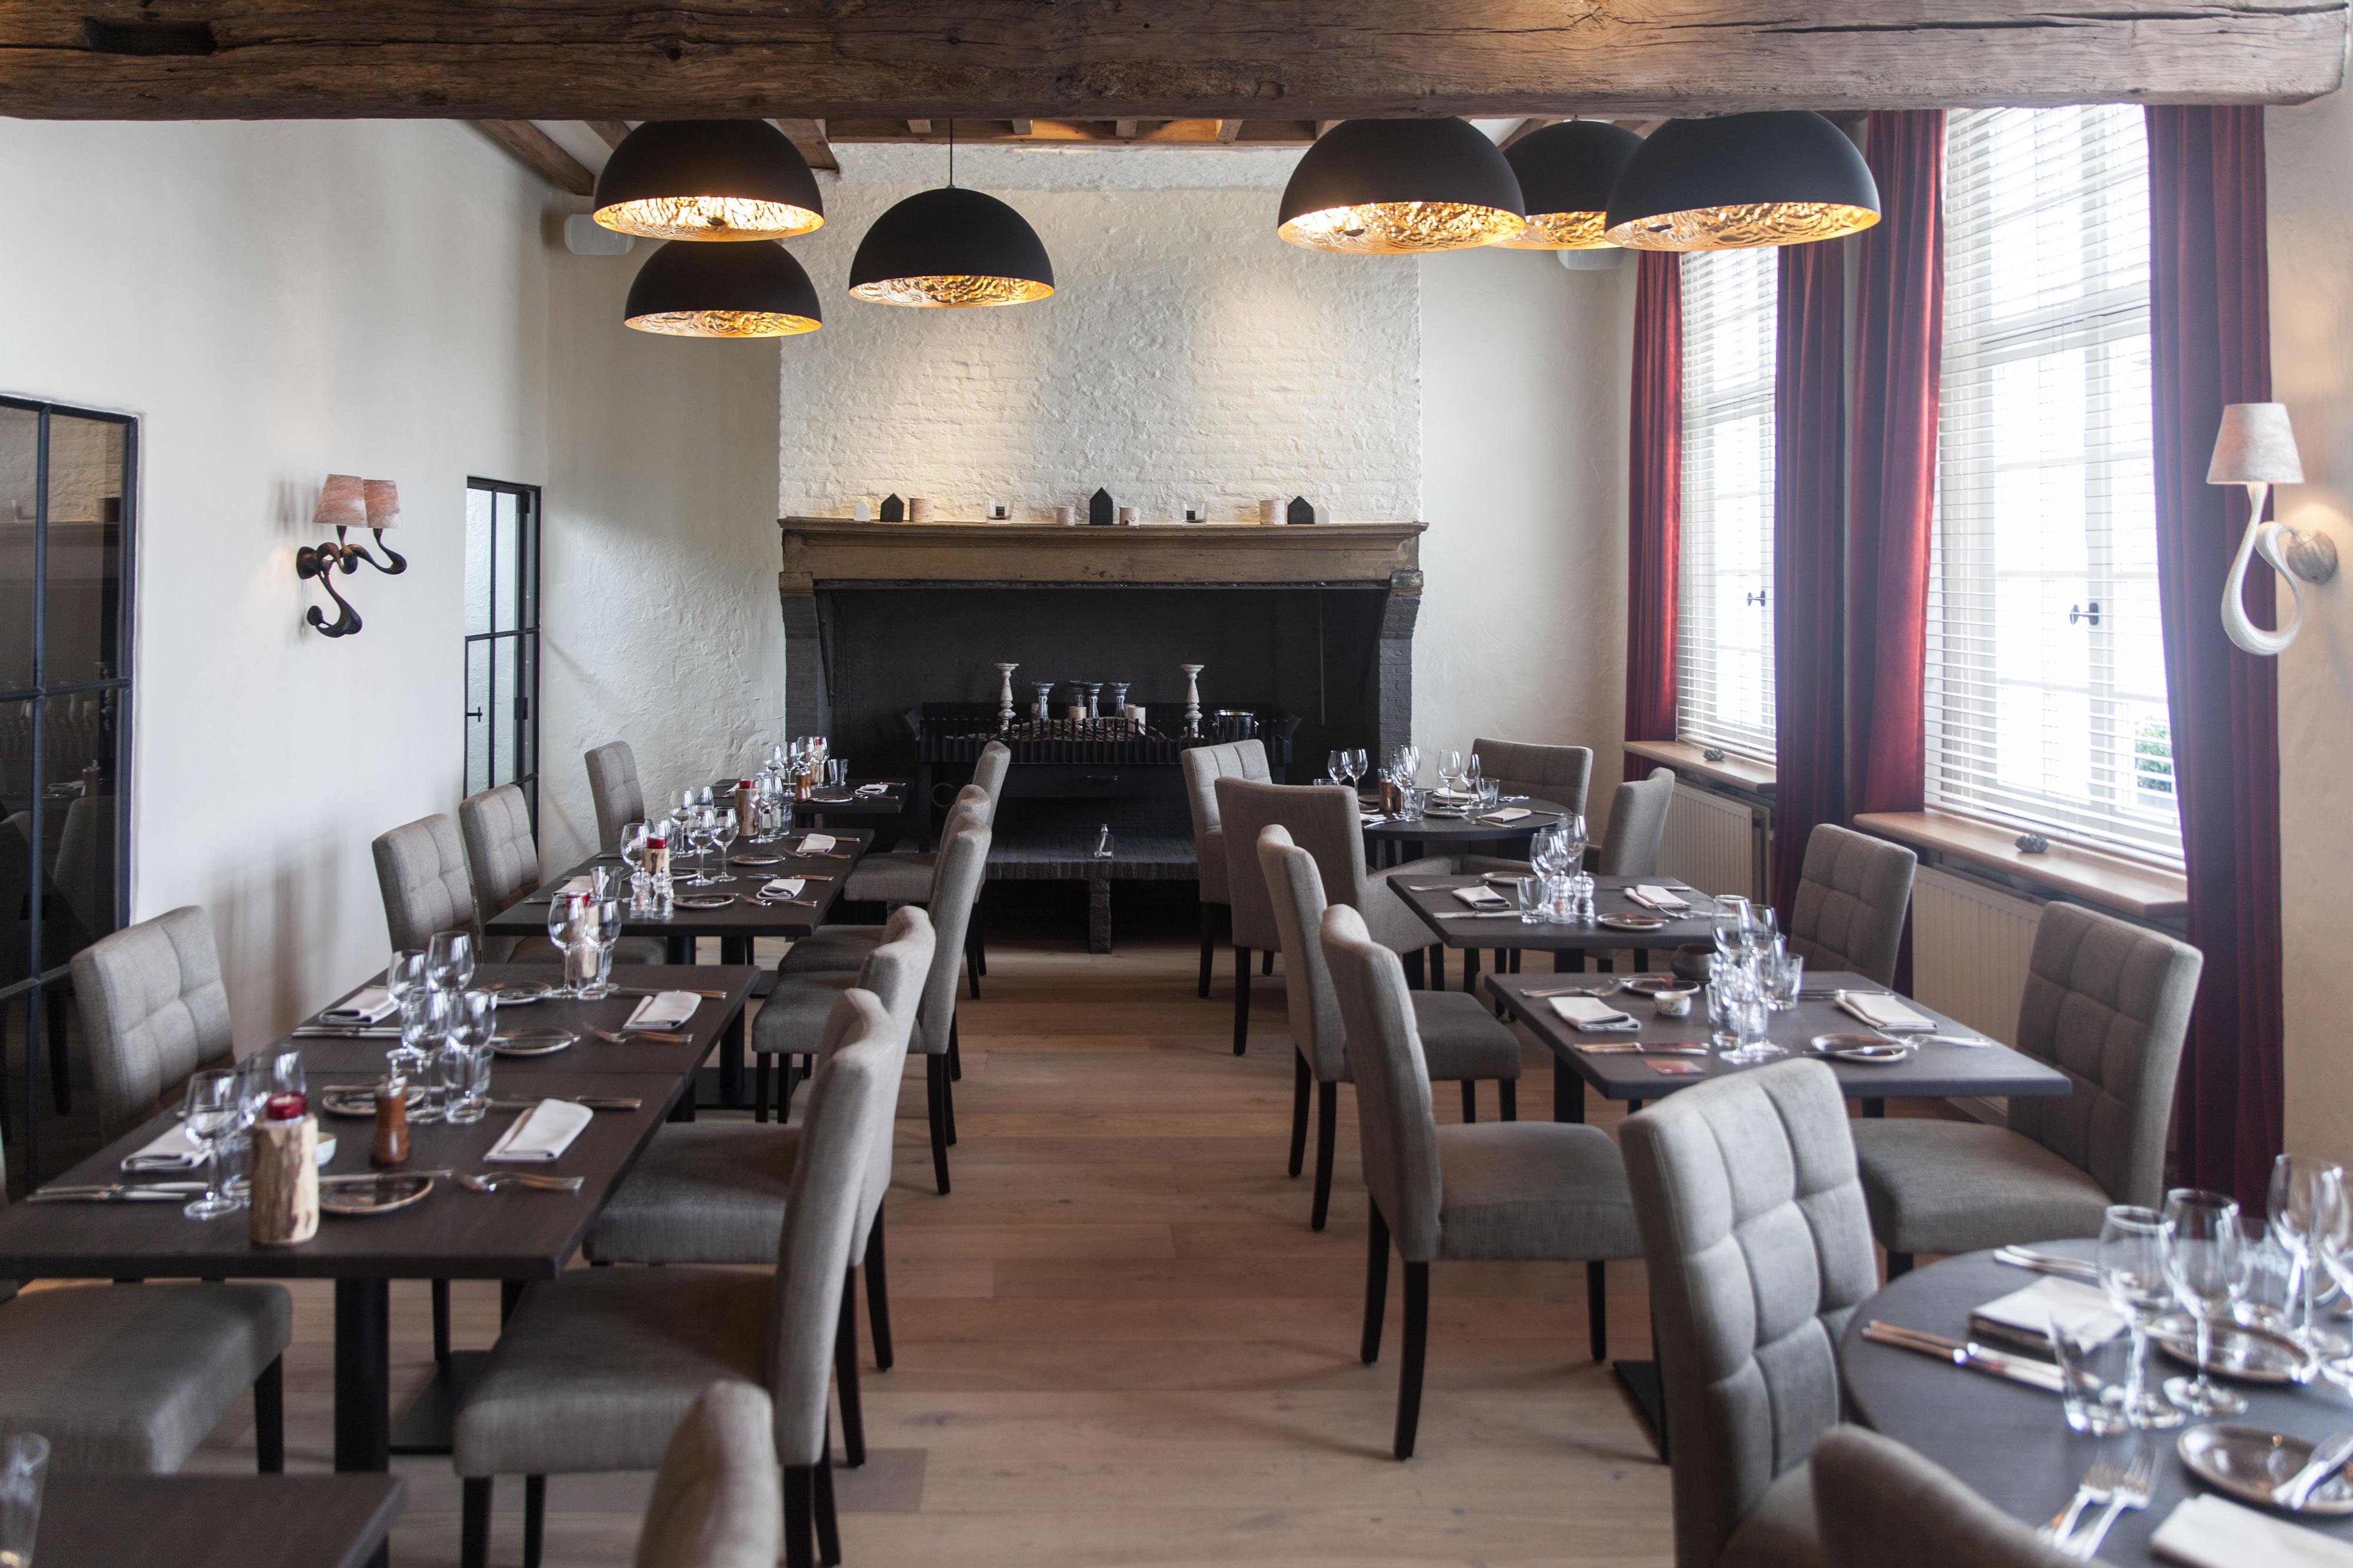 Total makeover restaurant 39 t landhuys nokere yves de wintere decoratie schilderwerken waregem - Interieur decoratie ontwerp ...